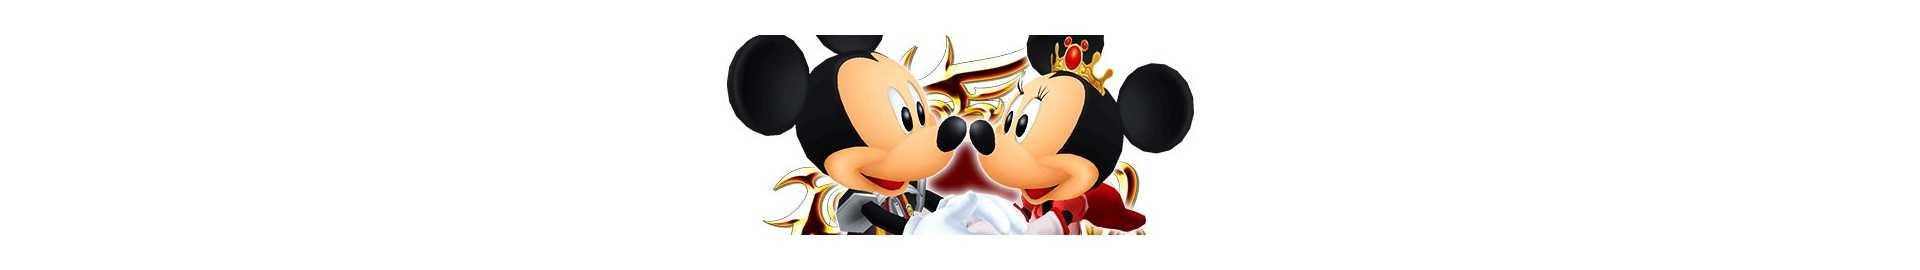 Mickey Mouse - Minnie - Rasoline L.F.D. Home